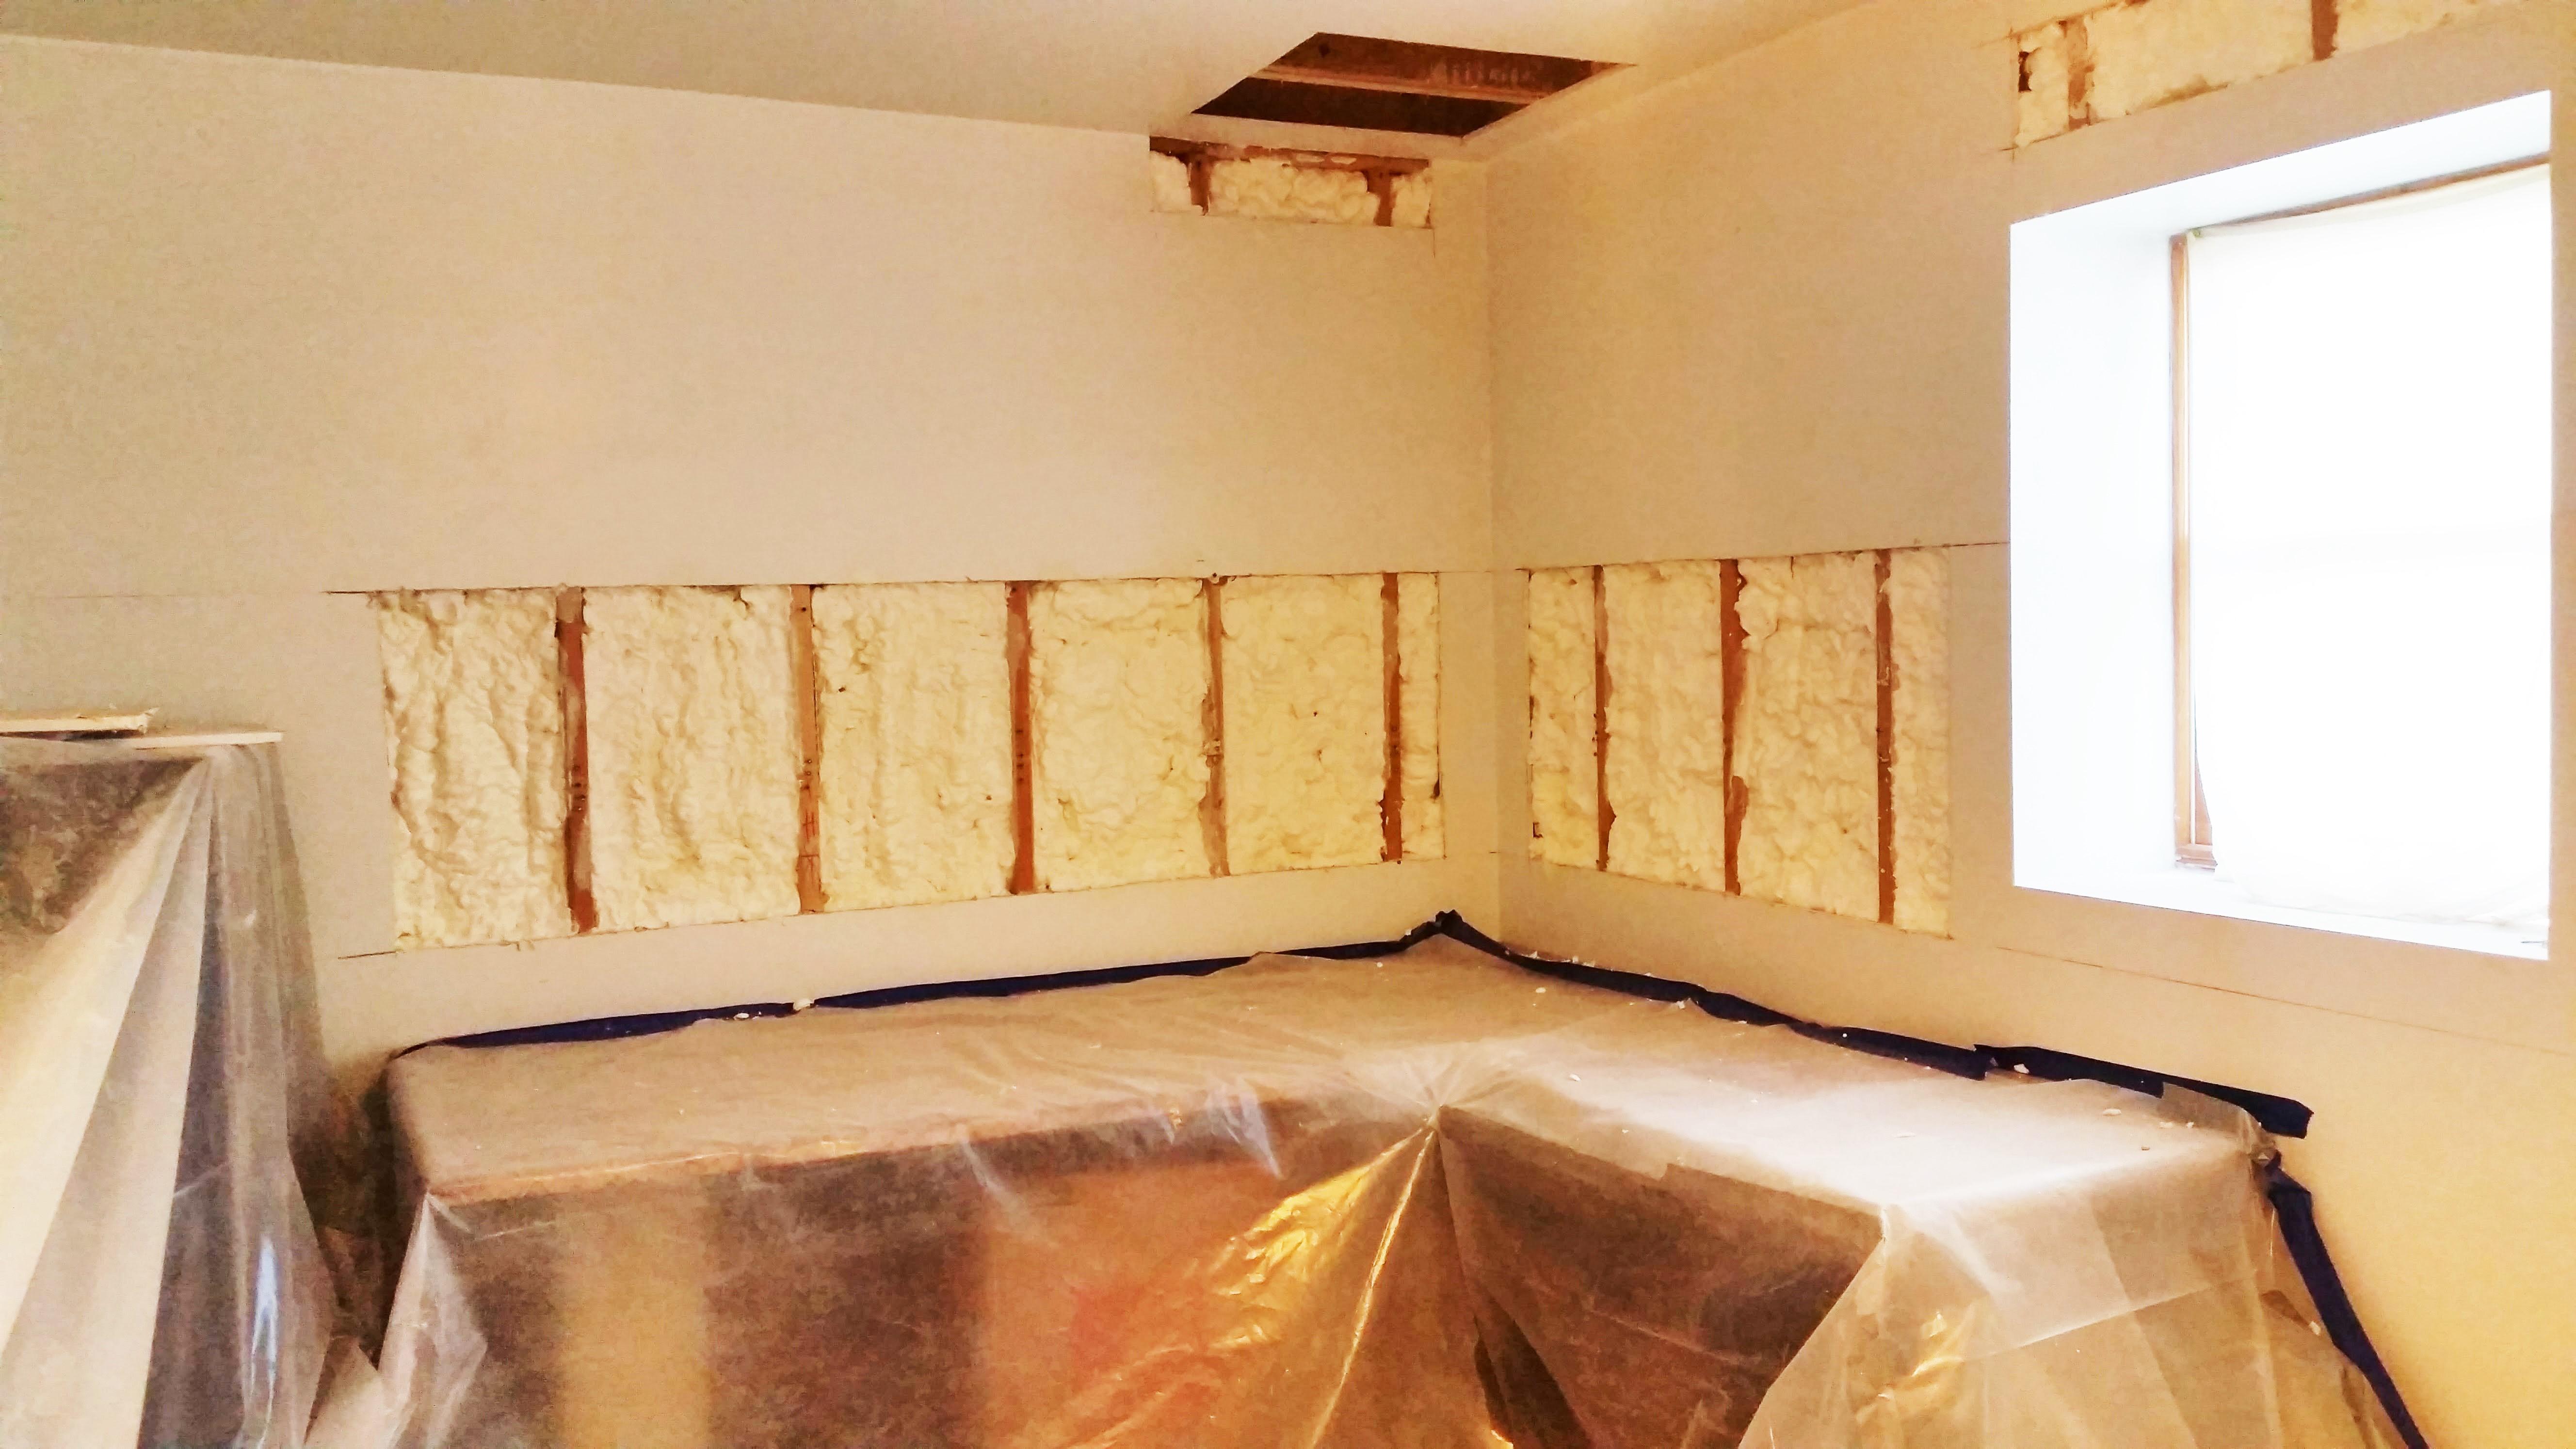 Retrofit Basement Exterior Walls   Spray Foam Insulation NYC Staten Island,  Brookly, Queens,